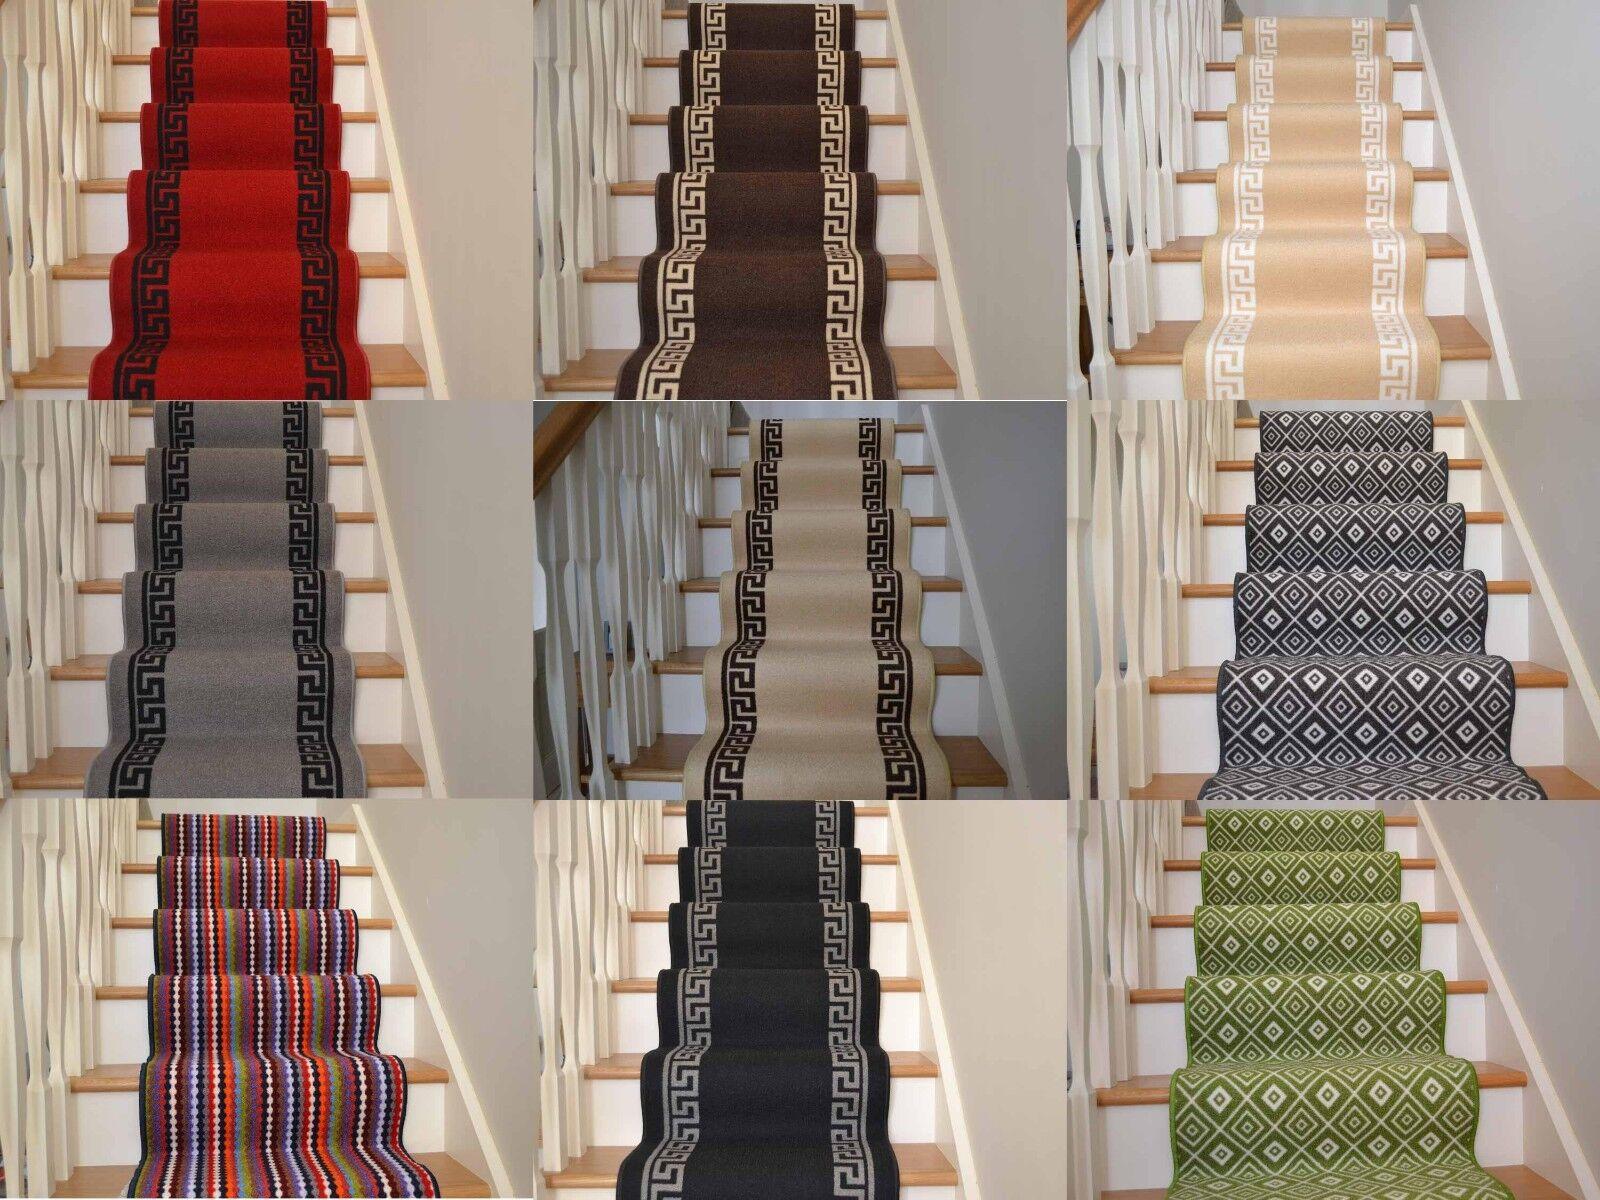 Cheap Carpet Tiles >> New Very Long Narrow Thin Stairway Staircase Carpet Runner